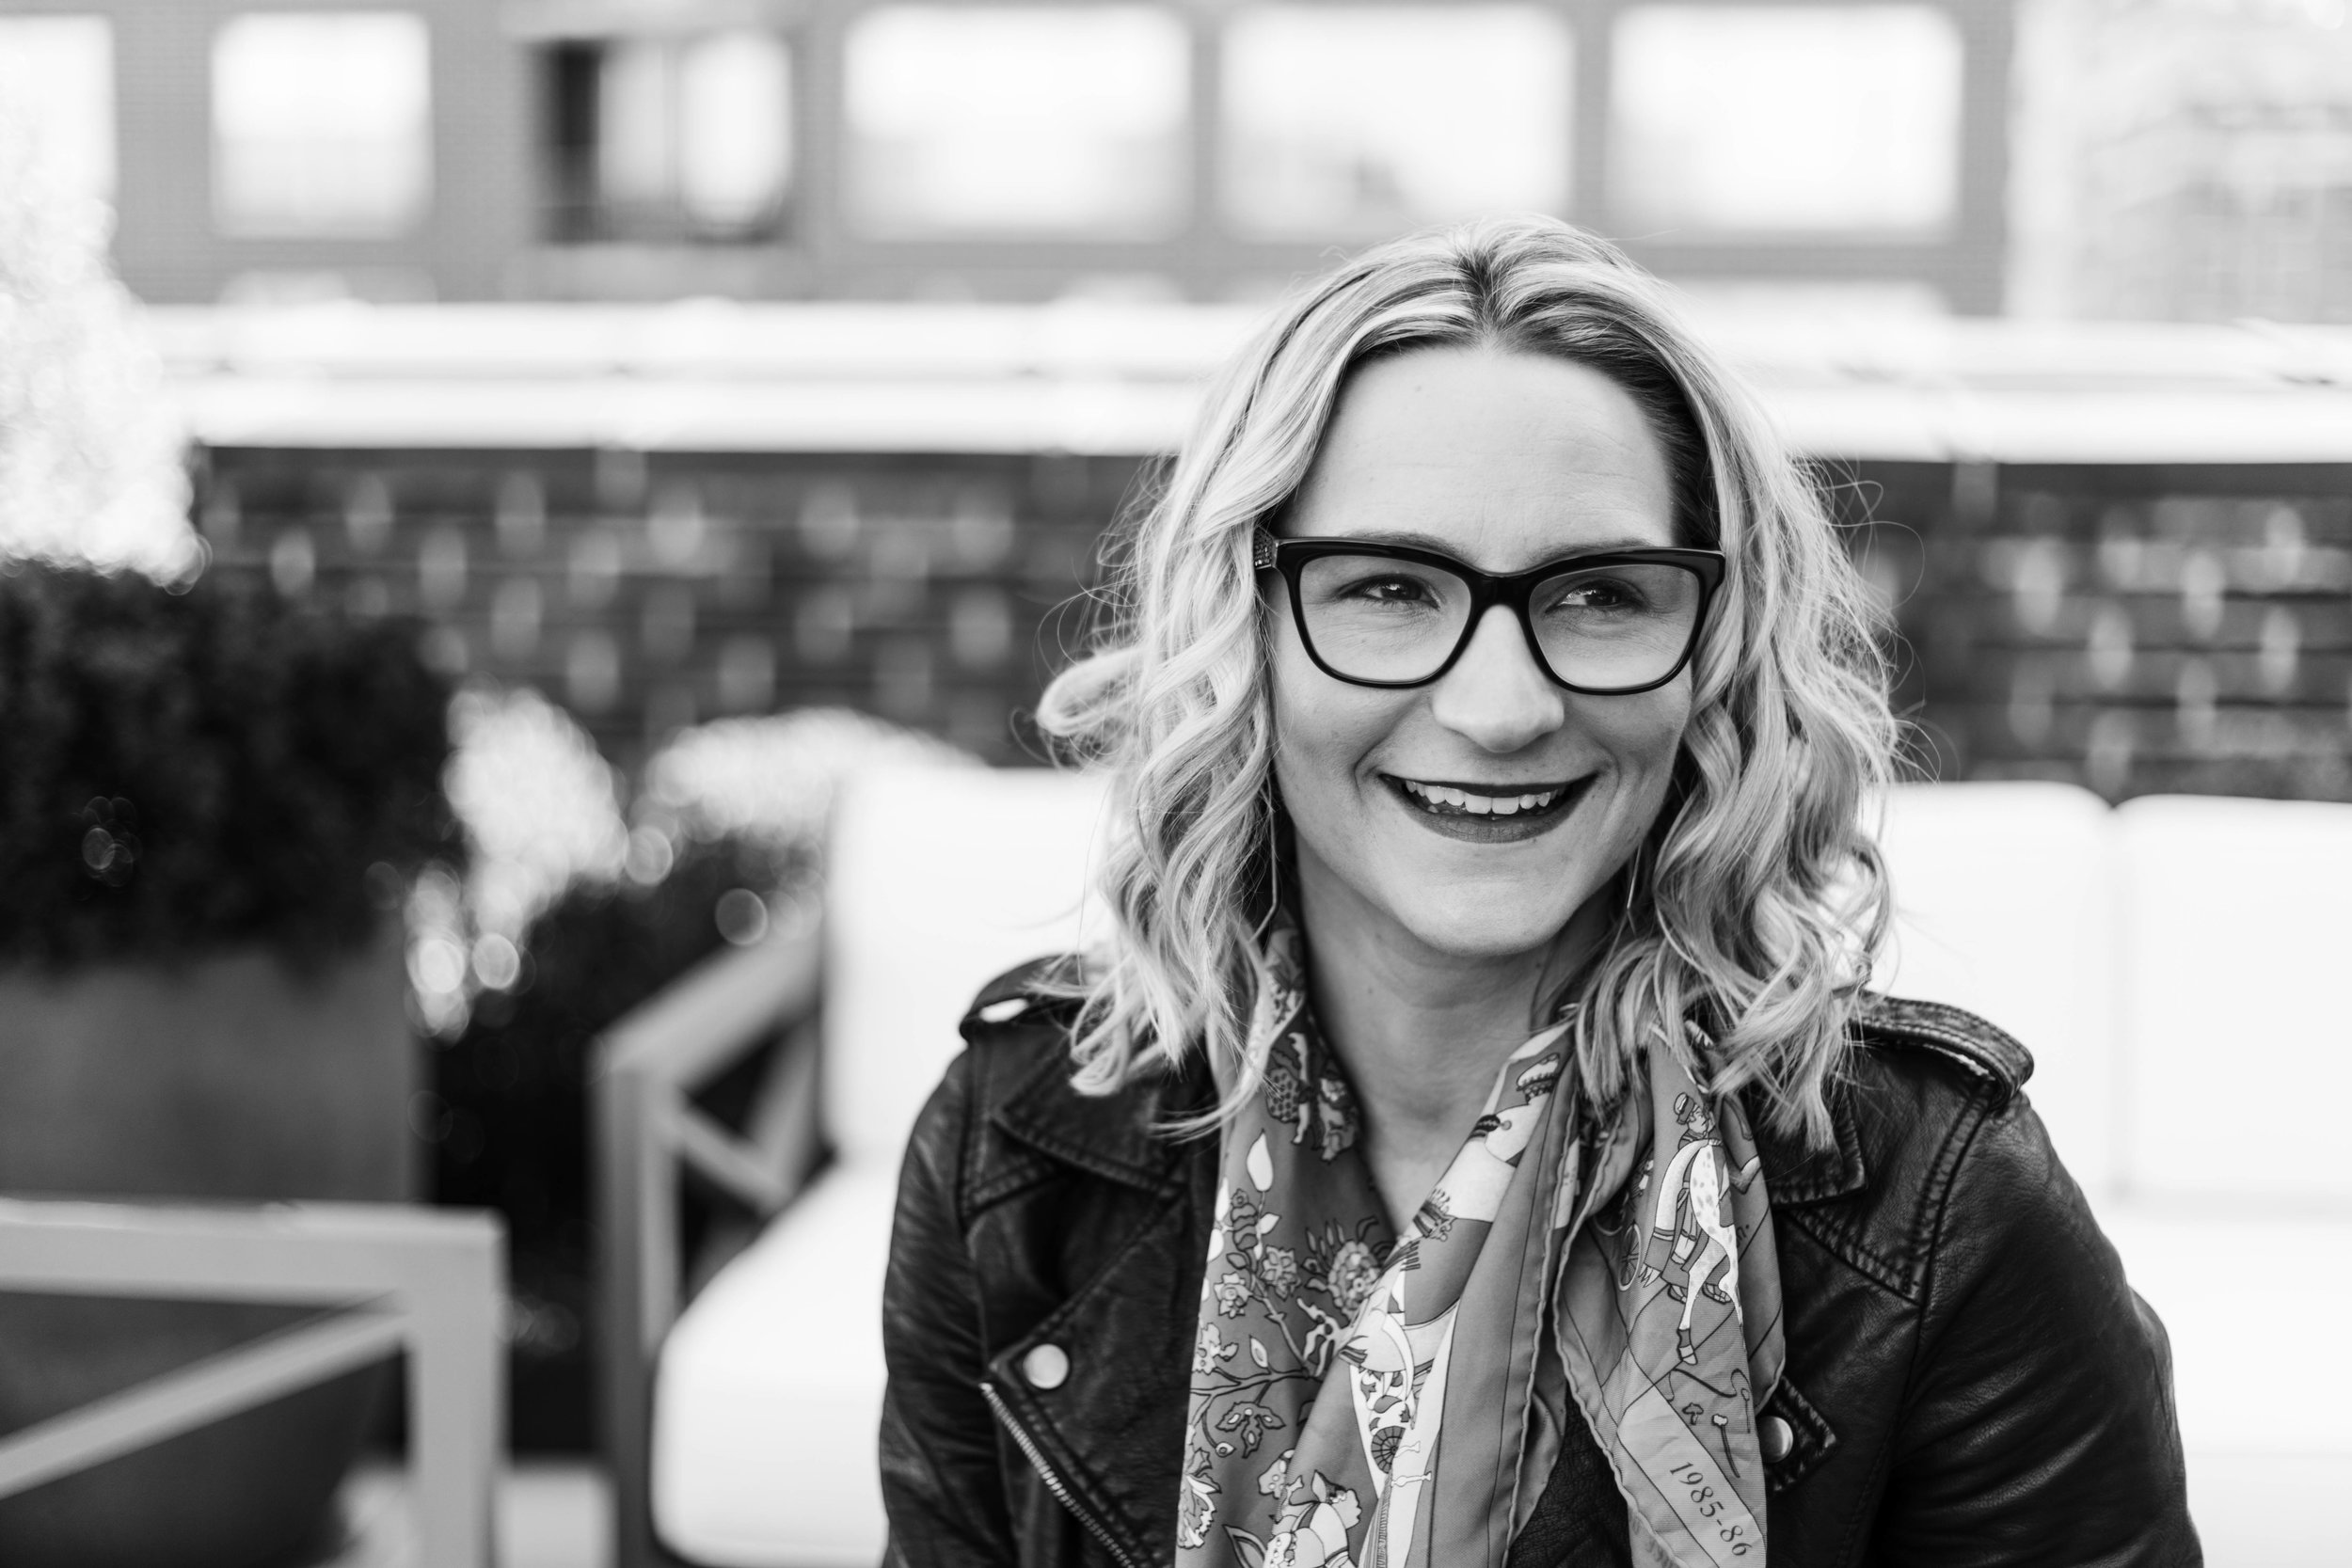 Headshot photography for Hanna Lee Style by branding photographer Katharine Hannah